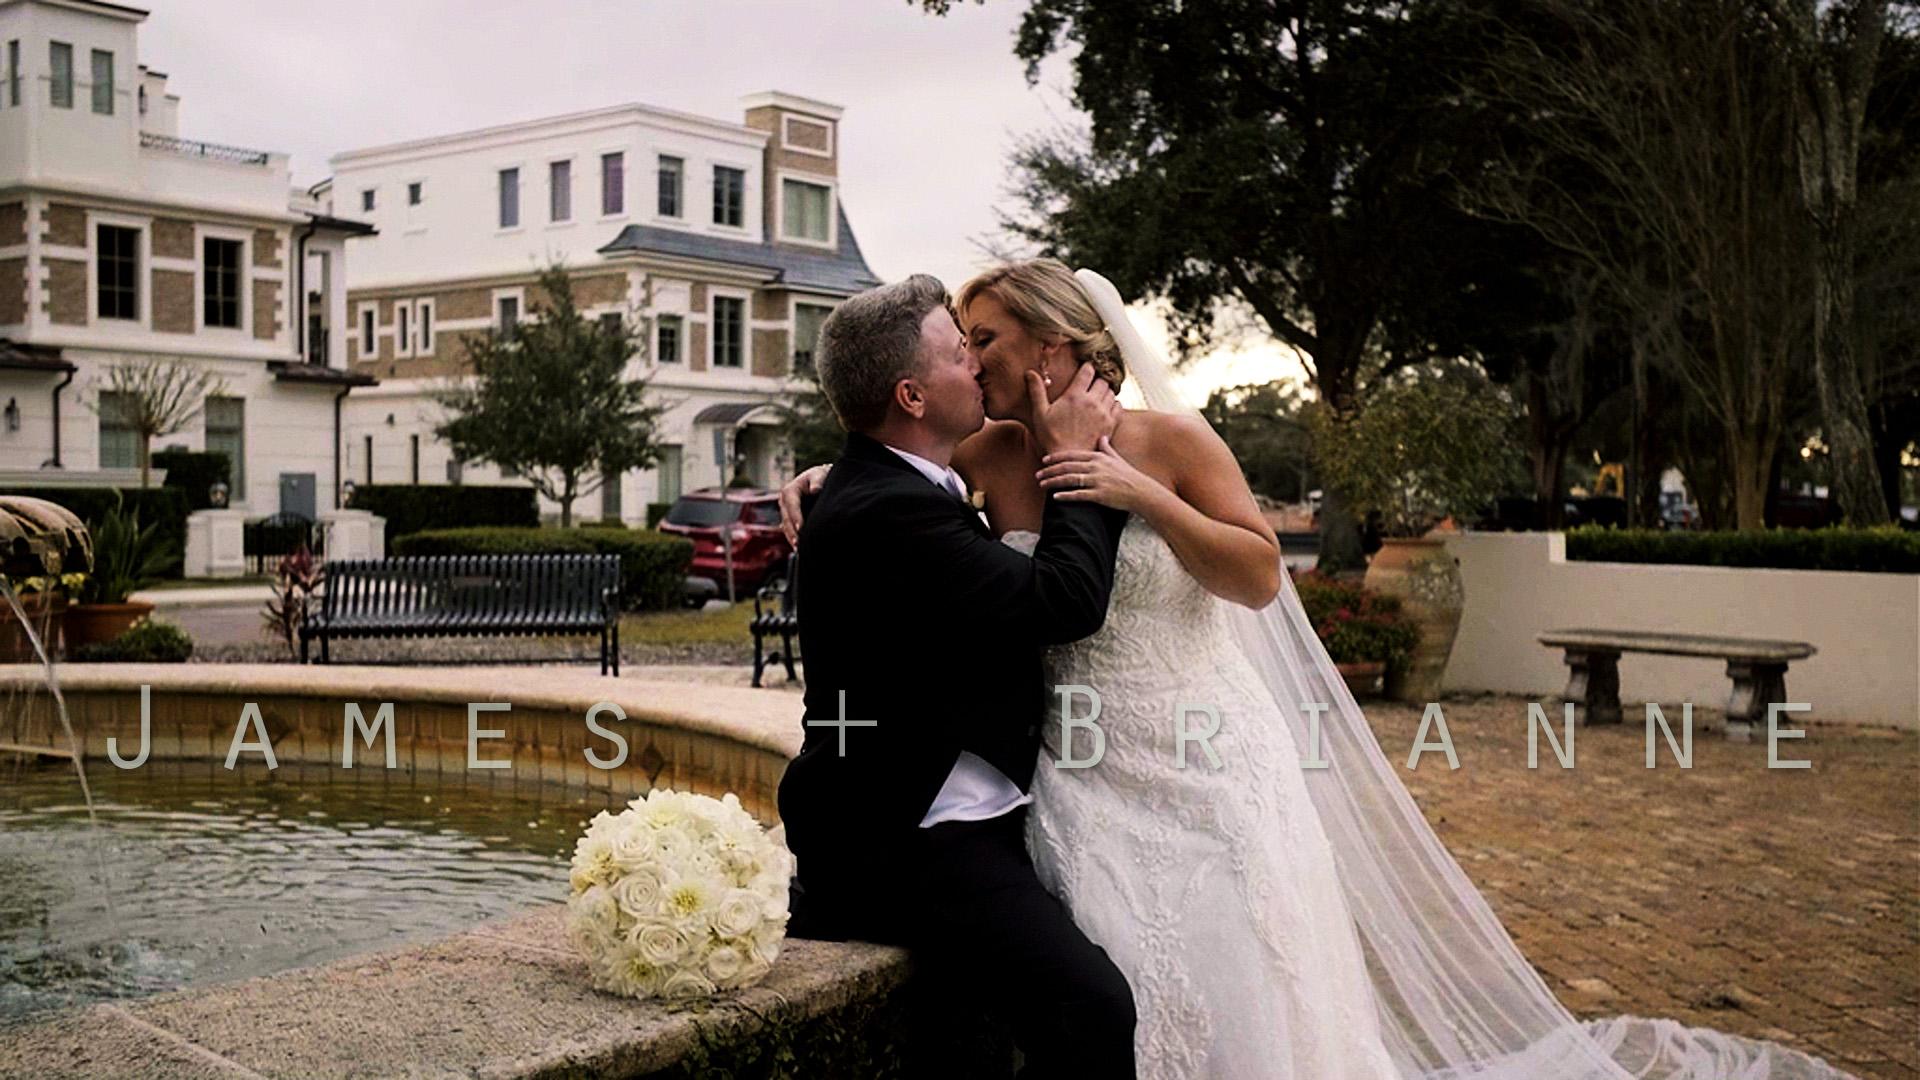 James + Brianne | Winter Park, Florida | Casa Feliz